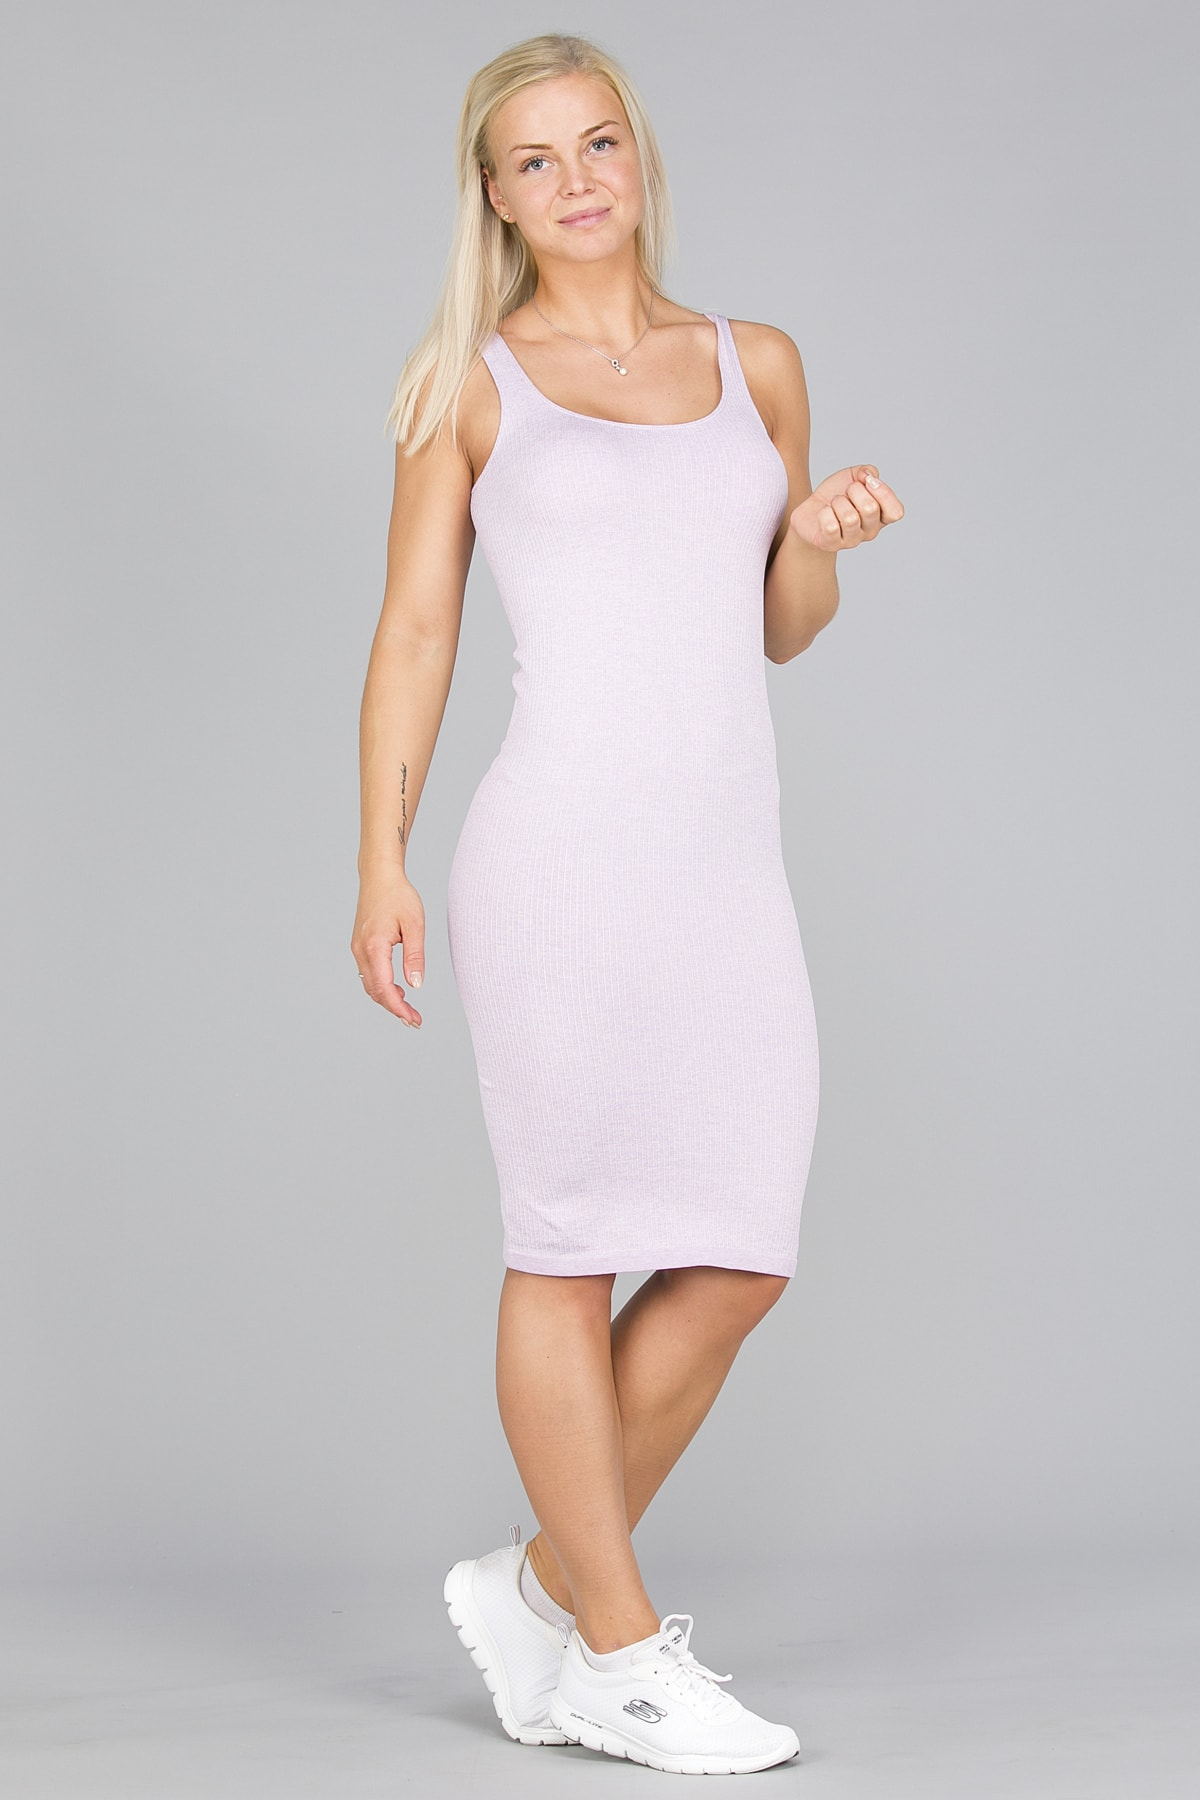 Aim'n Purple Ribbed Seamless Dress1